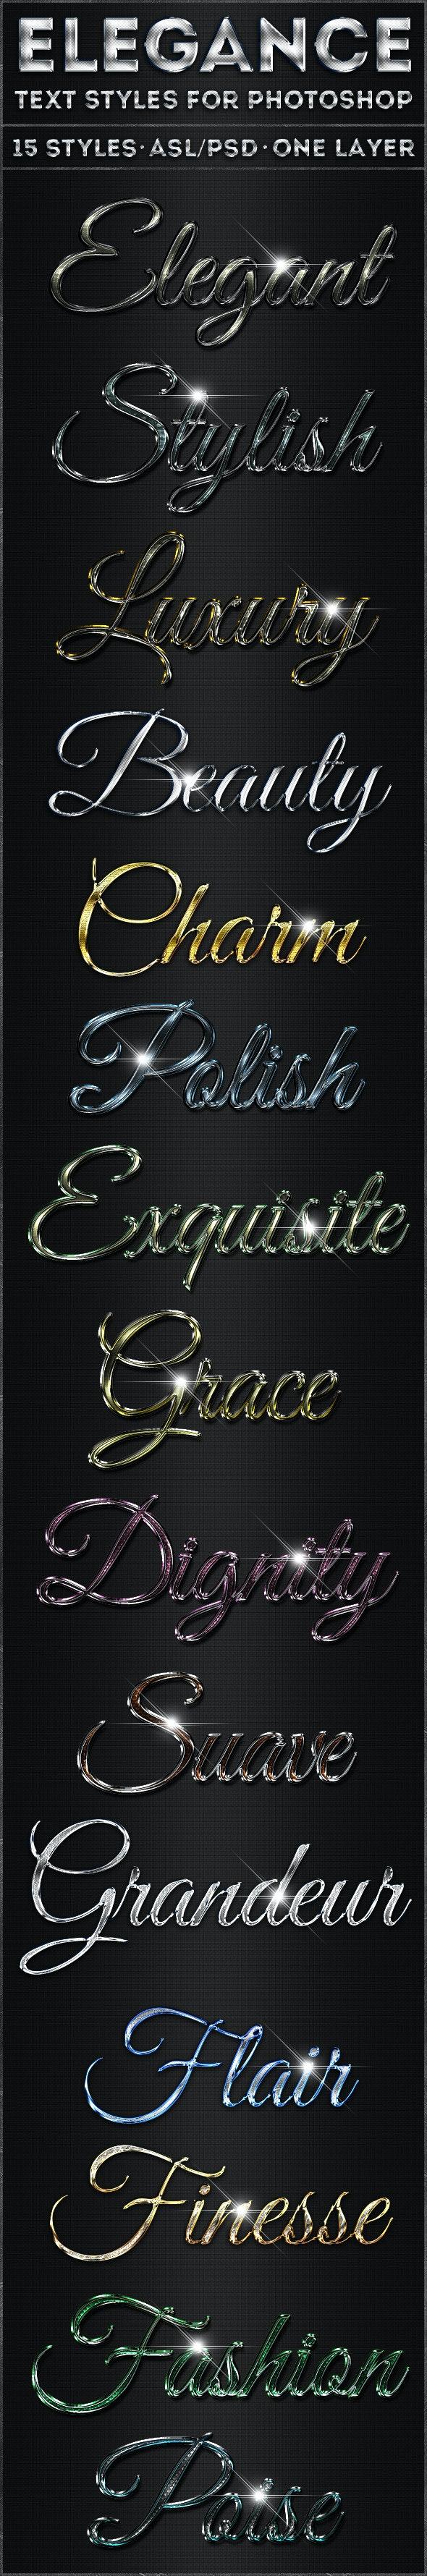 Elegance - Text Styles - Text Effects Styles